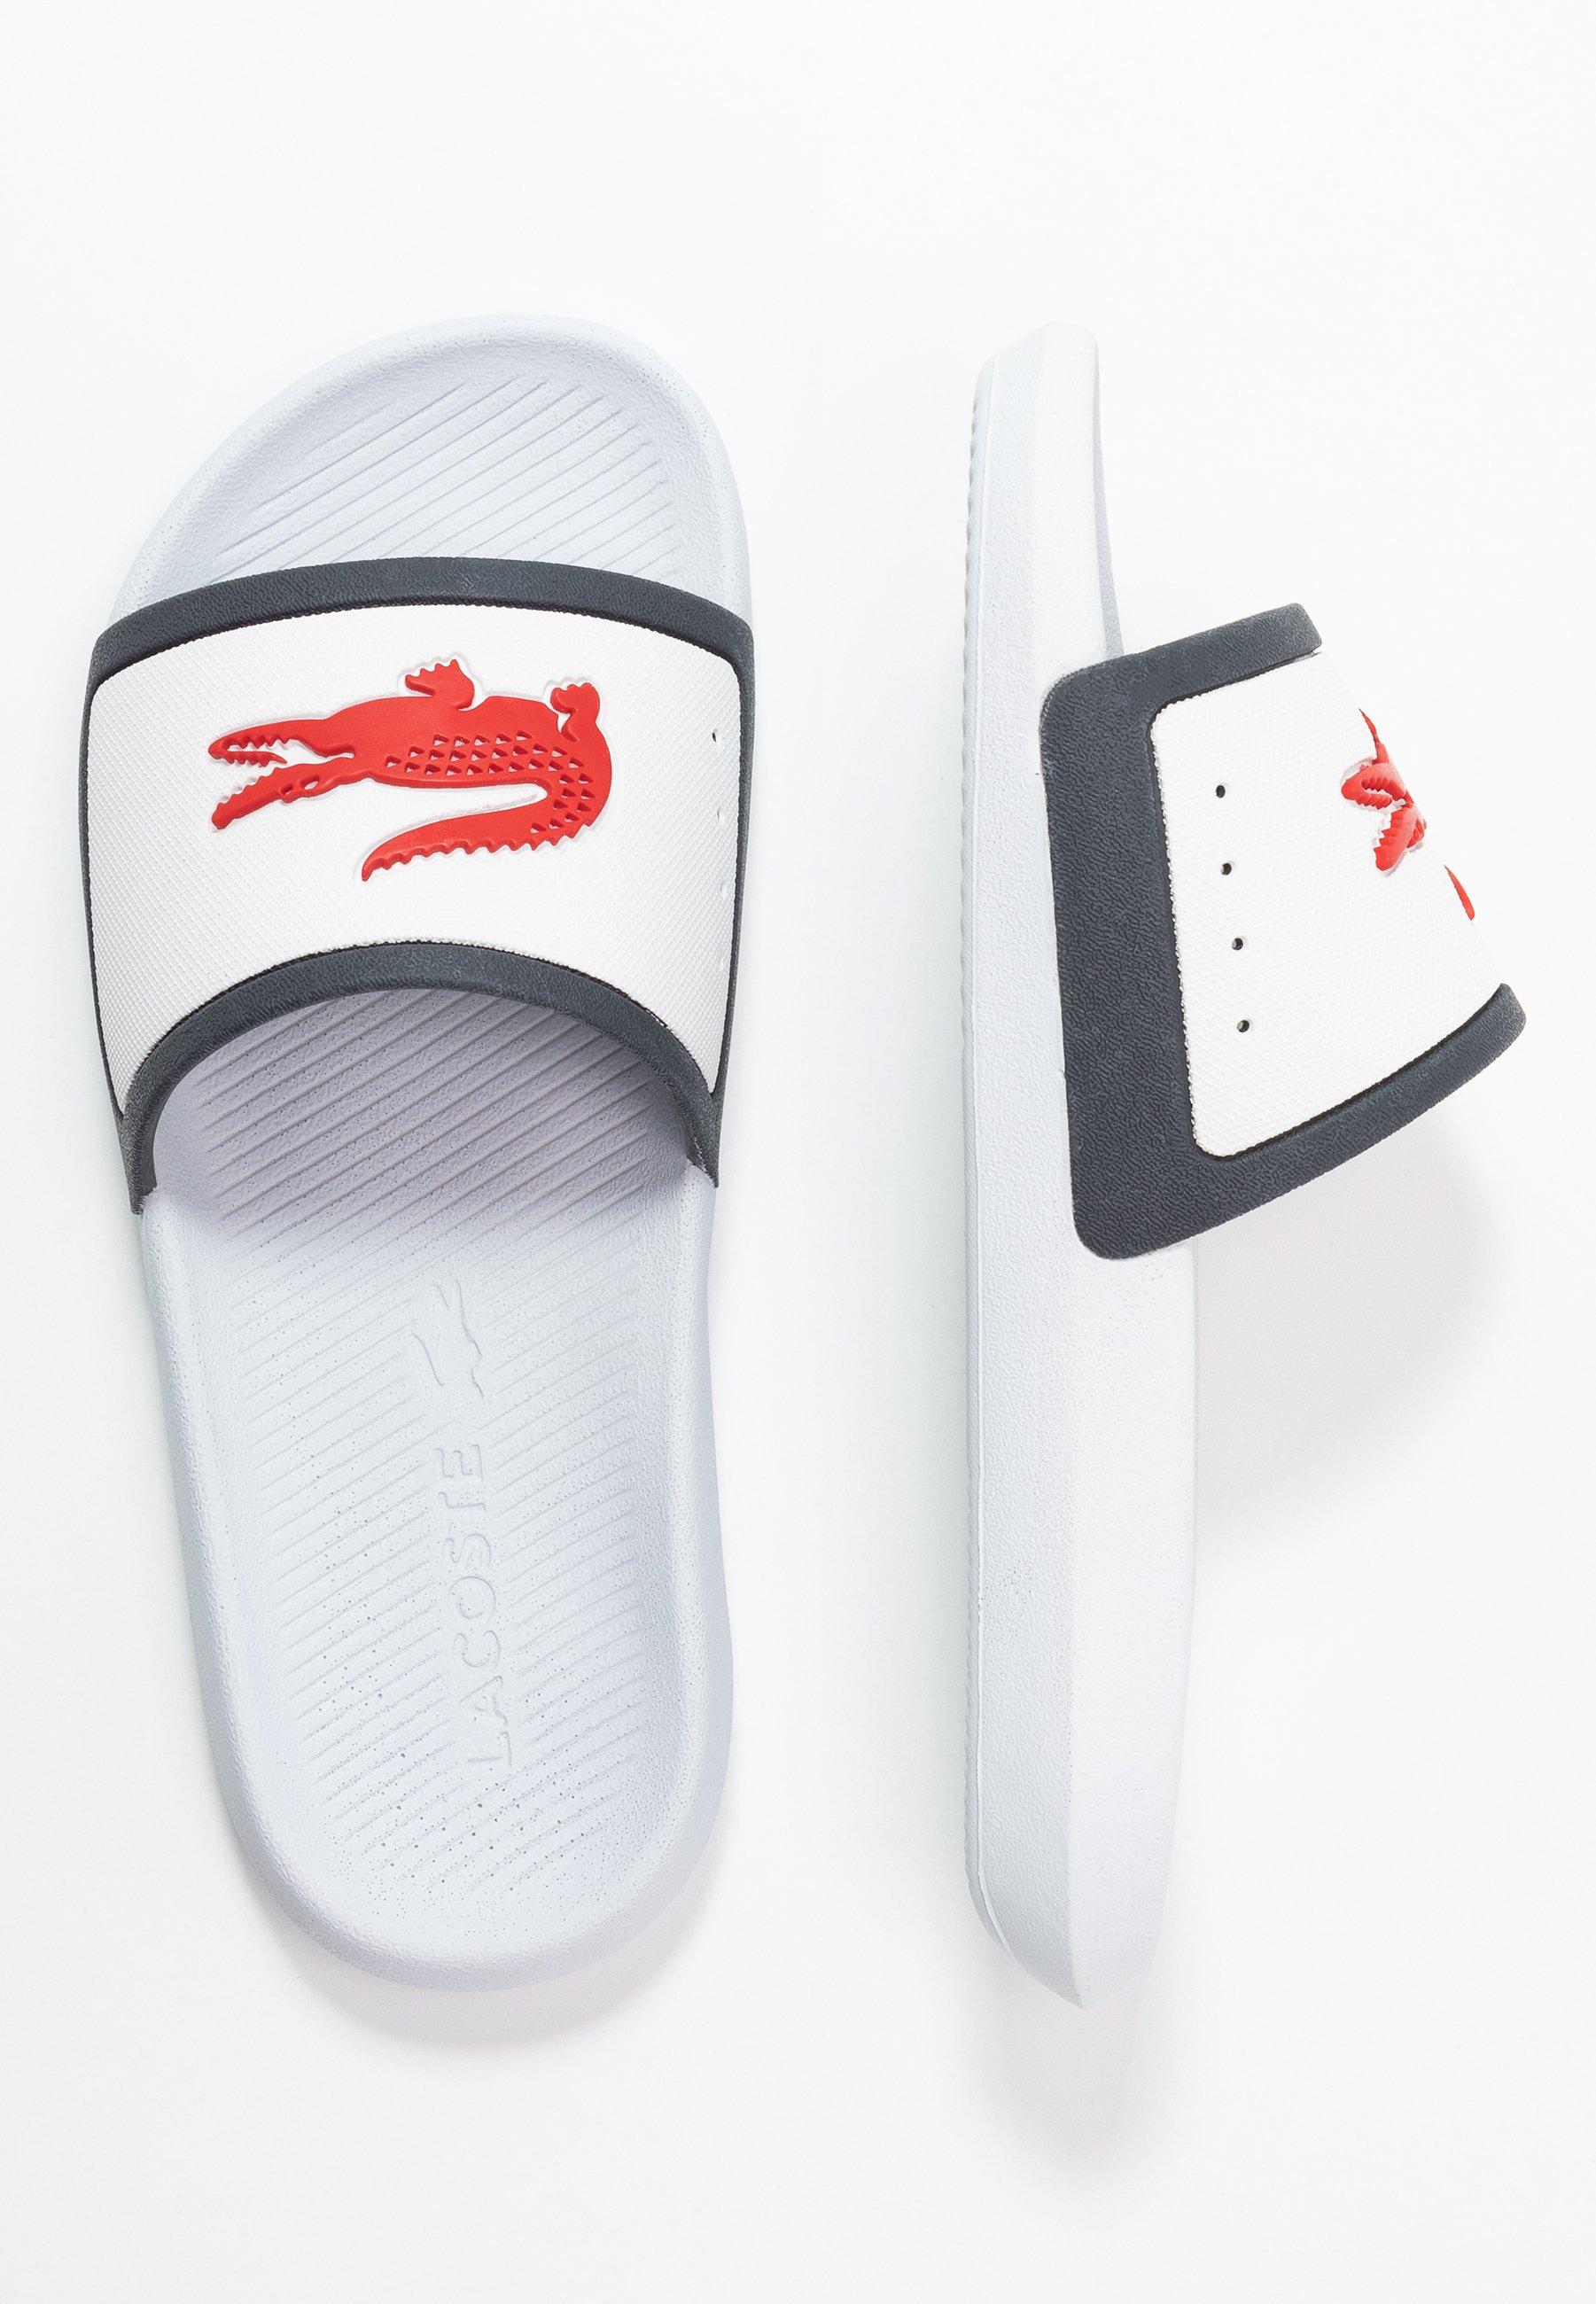 Women CROCO SLIDE  - Pool slides - white/navy/red